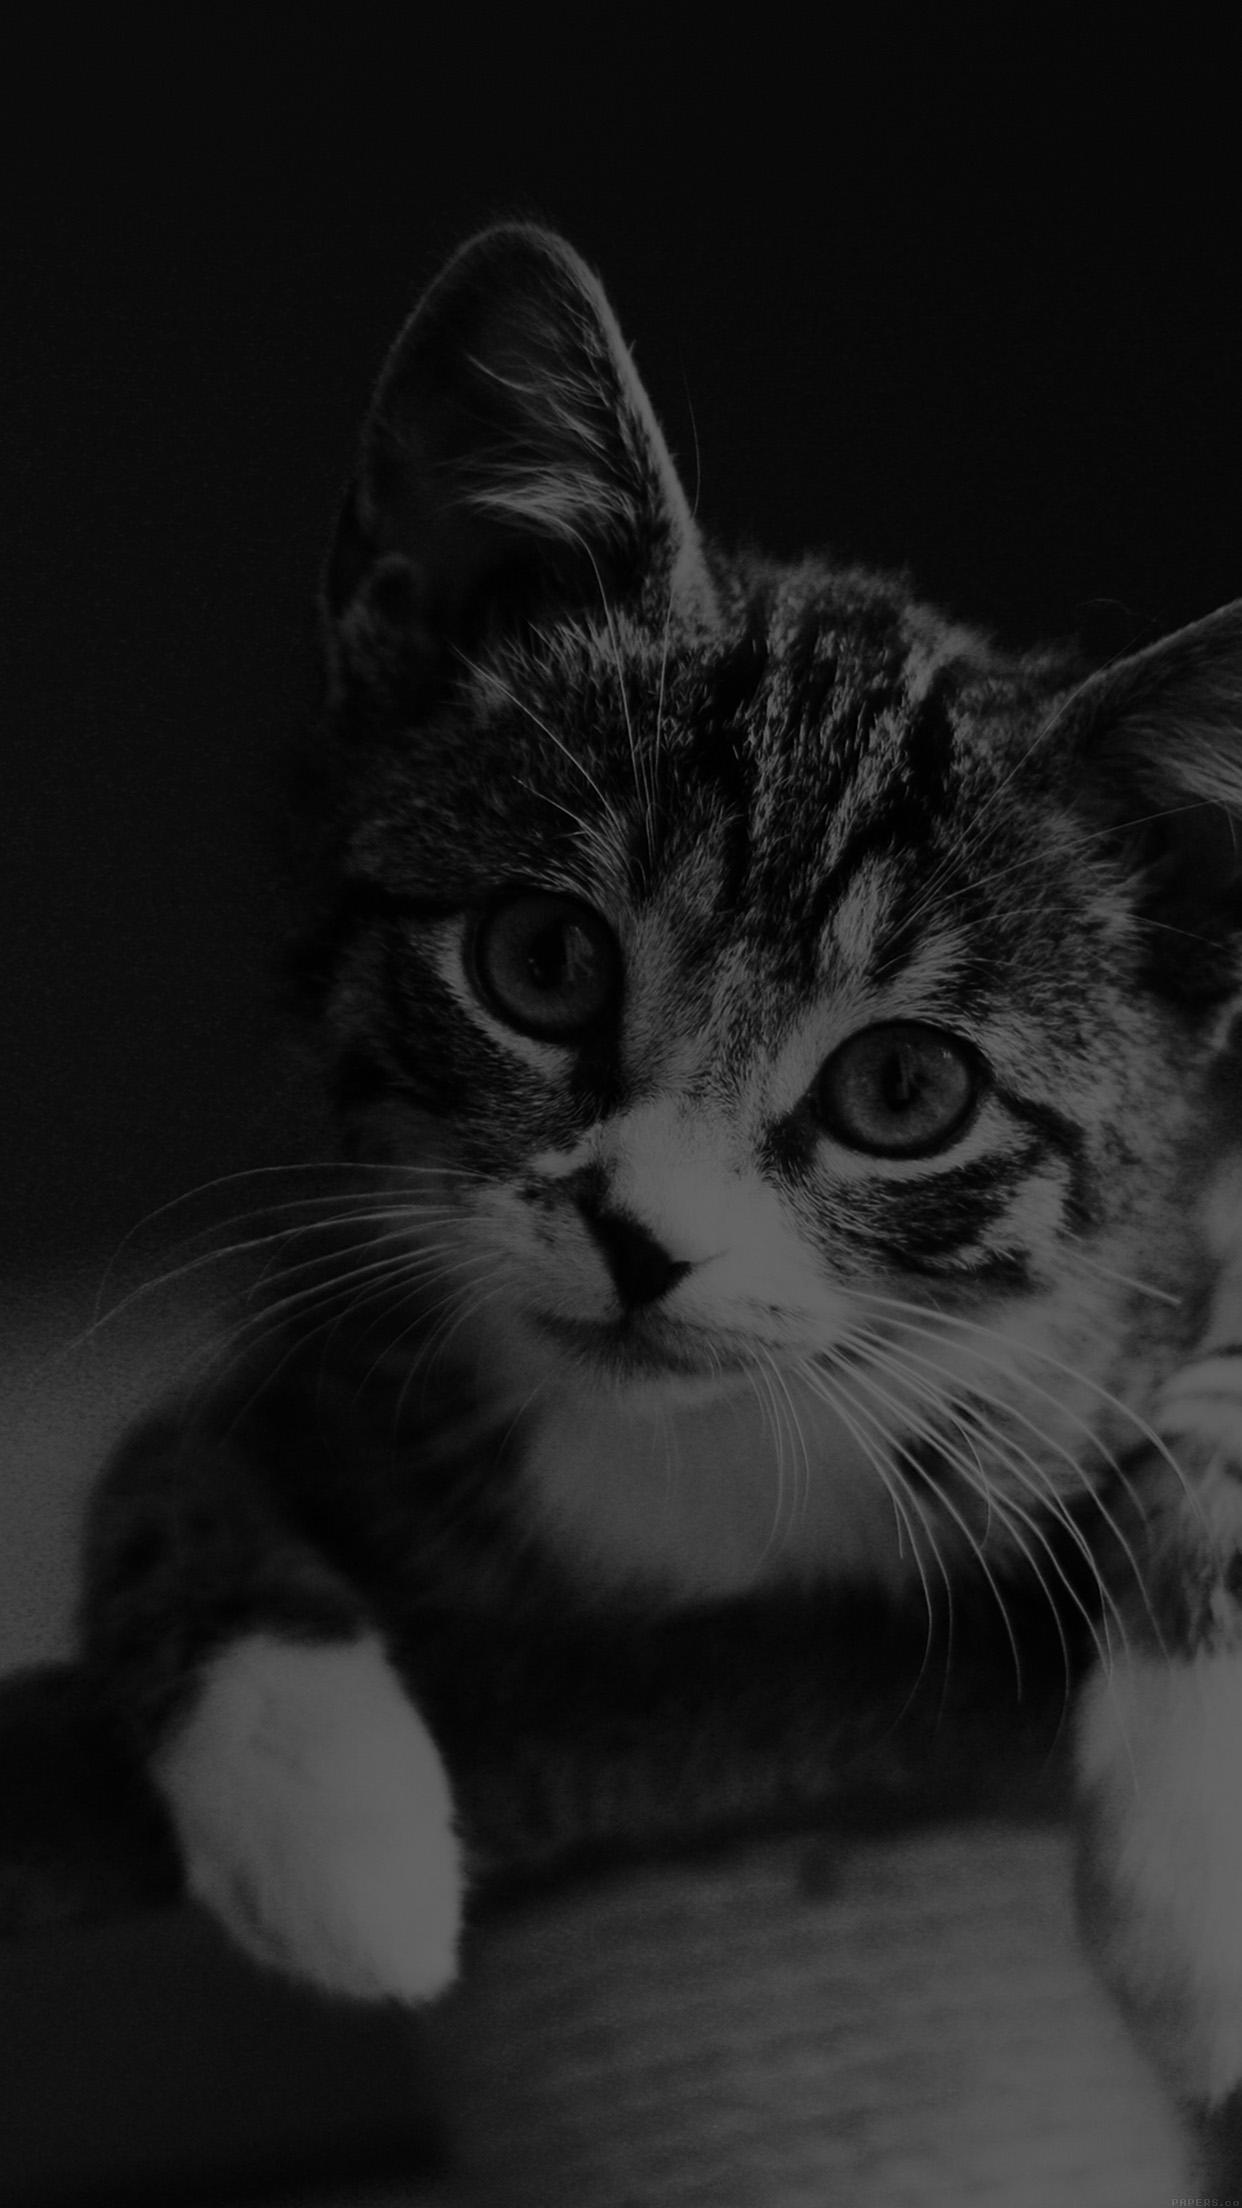 Iphonepapers Com Iphone Wallpaper Mi36 Cute Cat Look Dark Bw